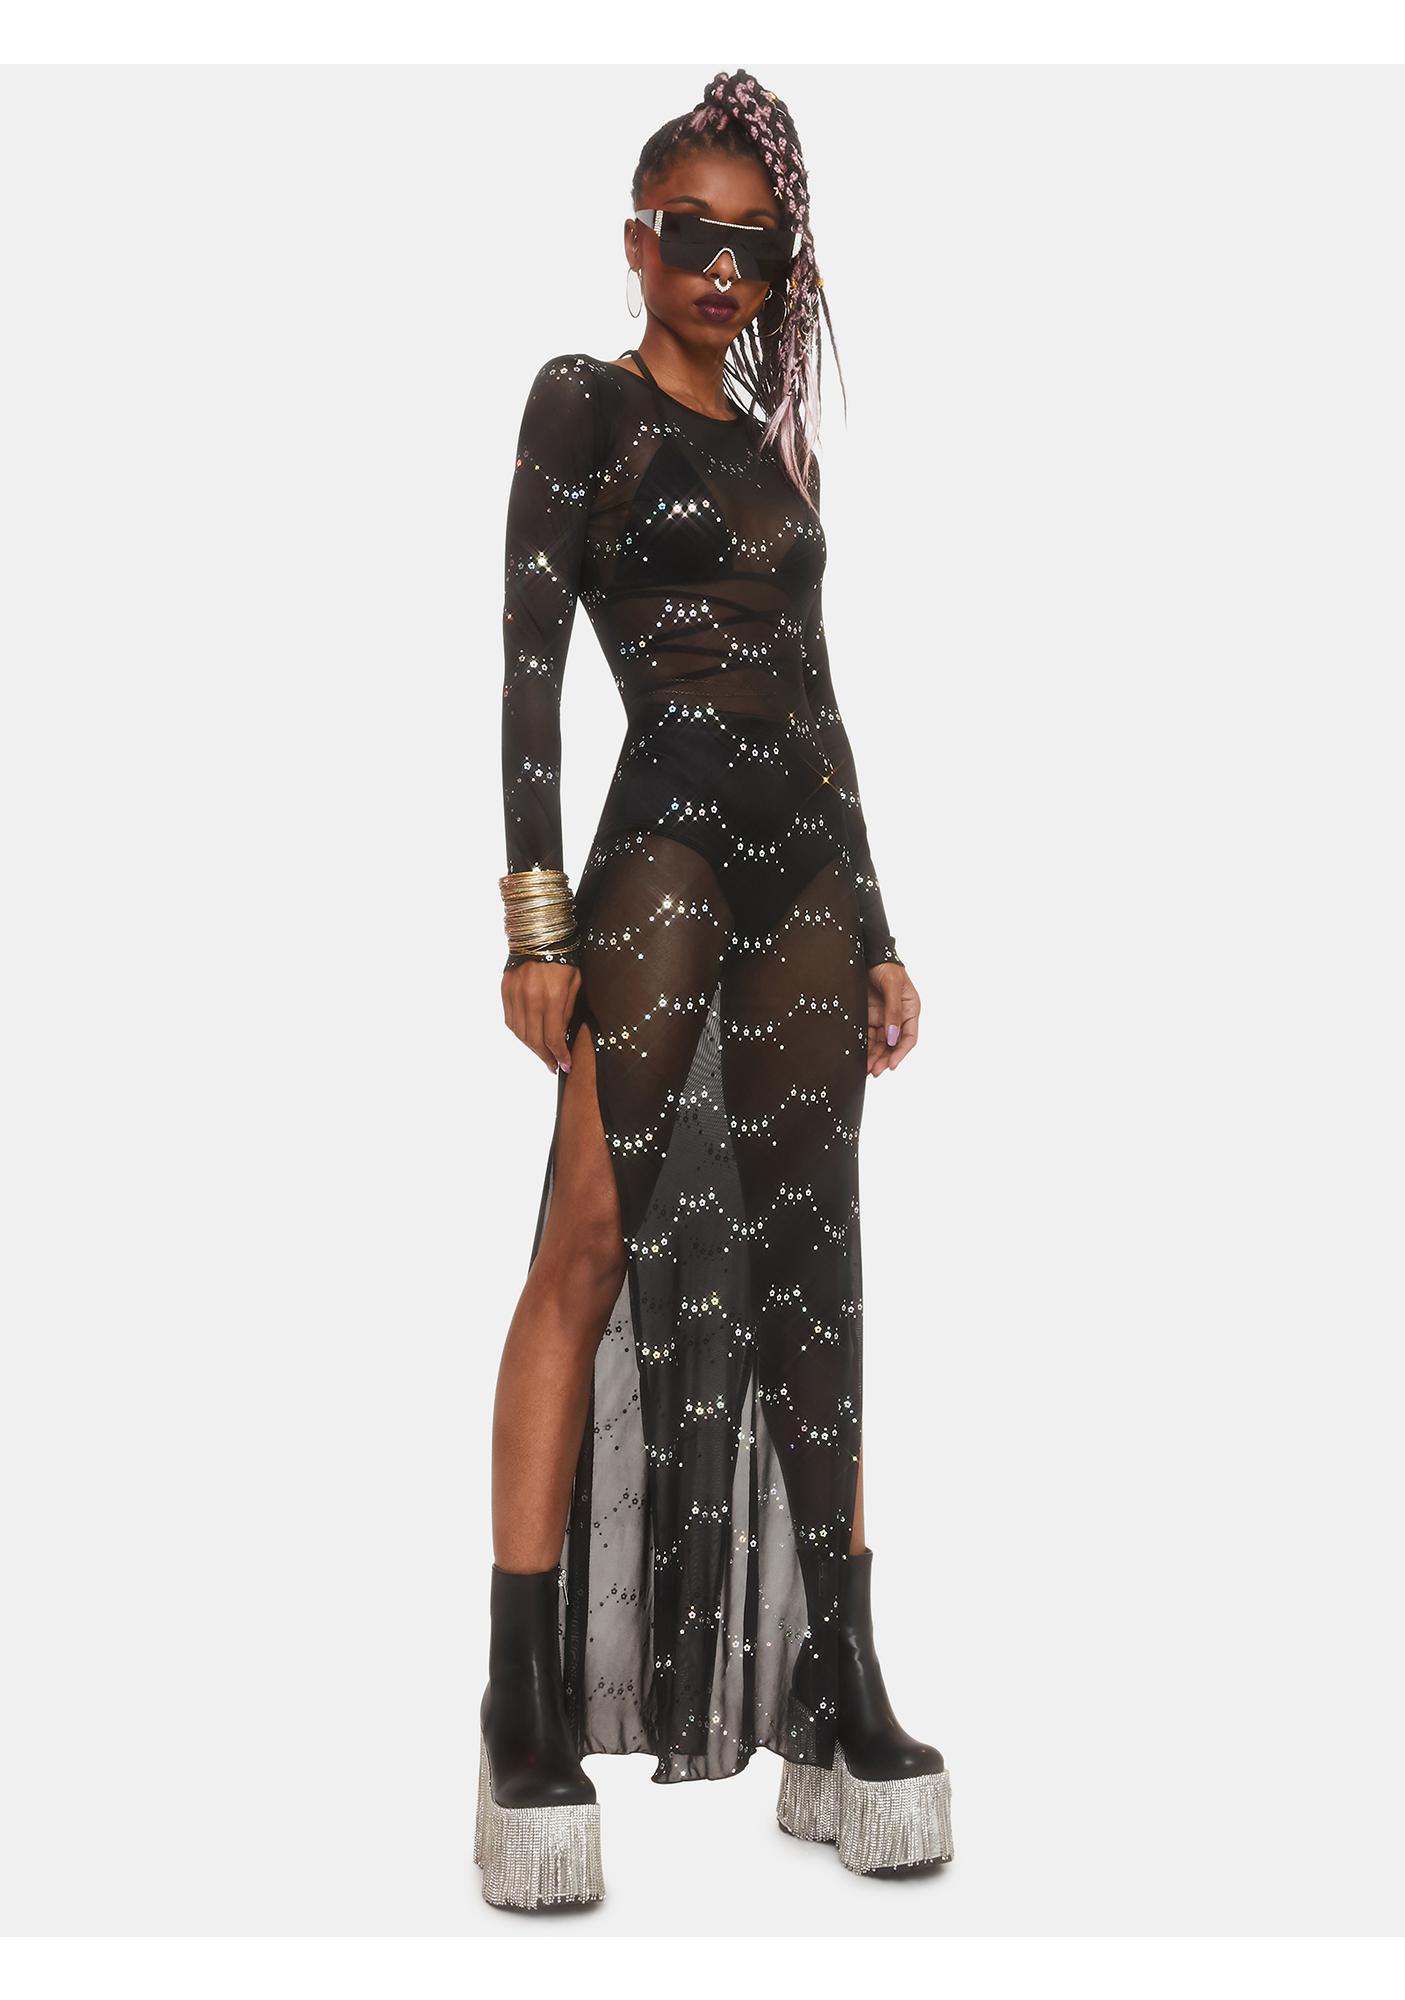 Club Exx Lunar Fantasy Mesh Maxi Dress